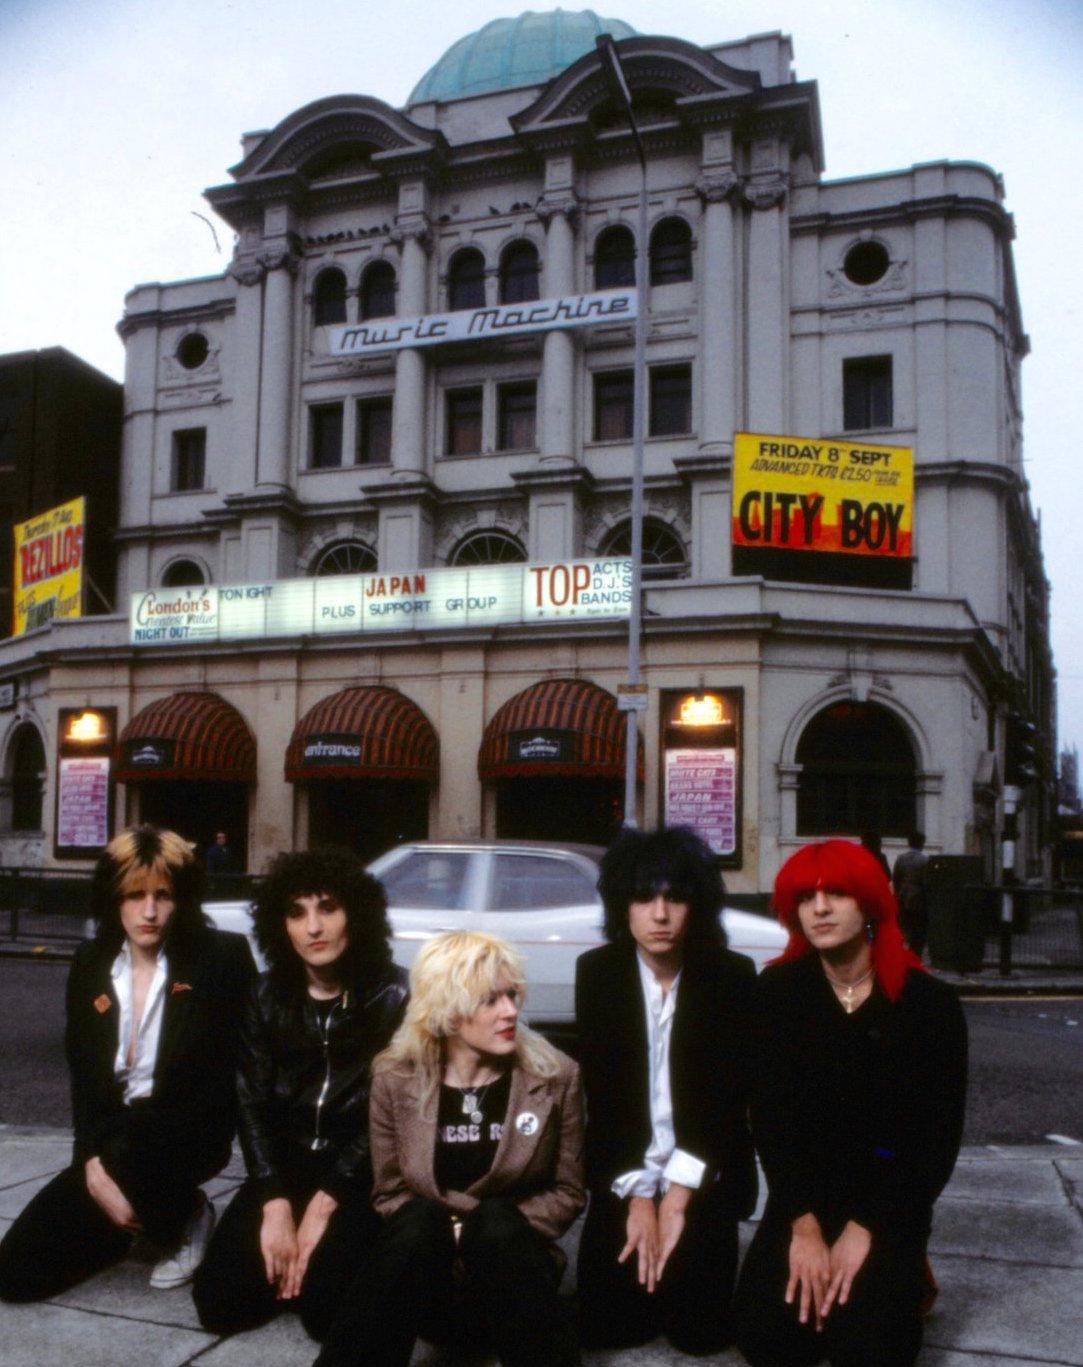 Japan at the Music Machine